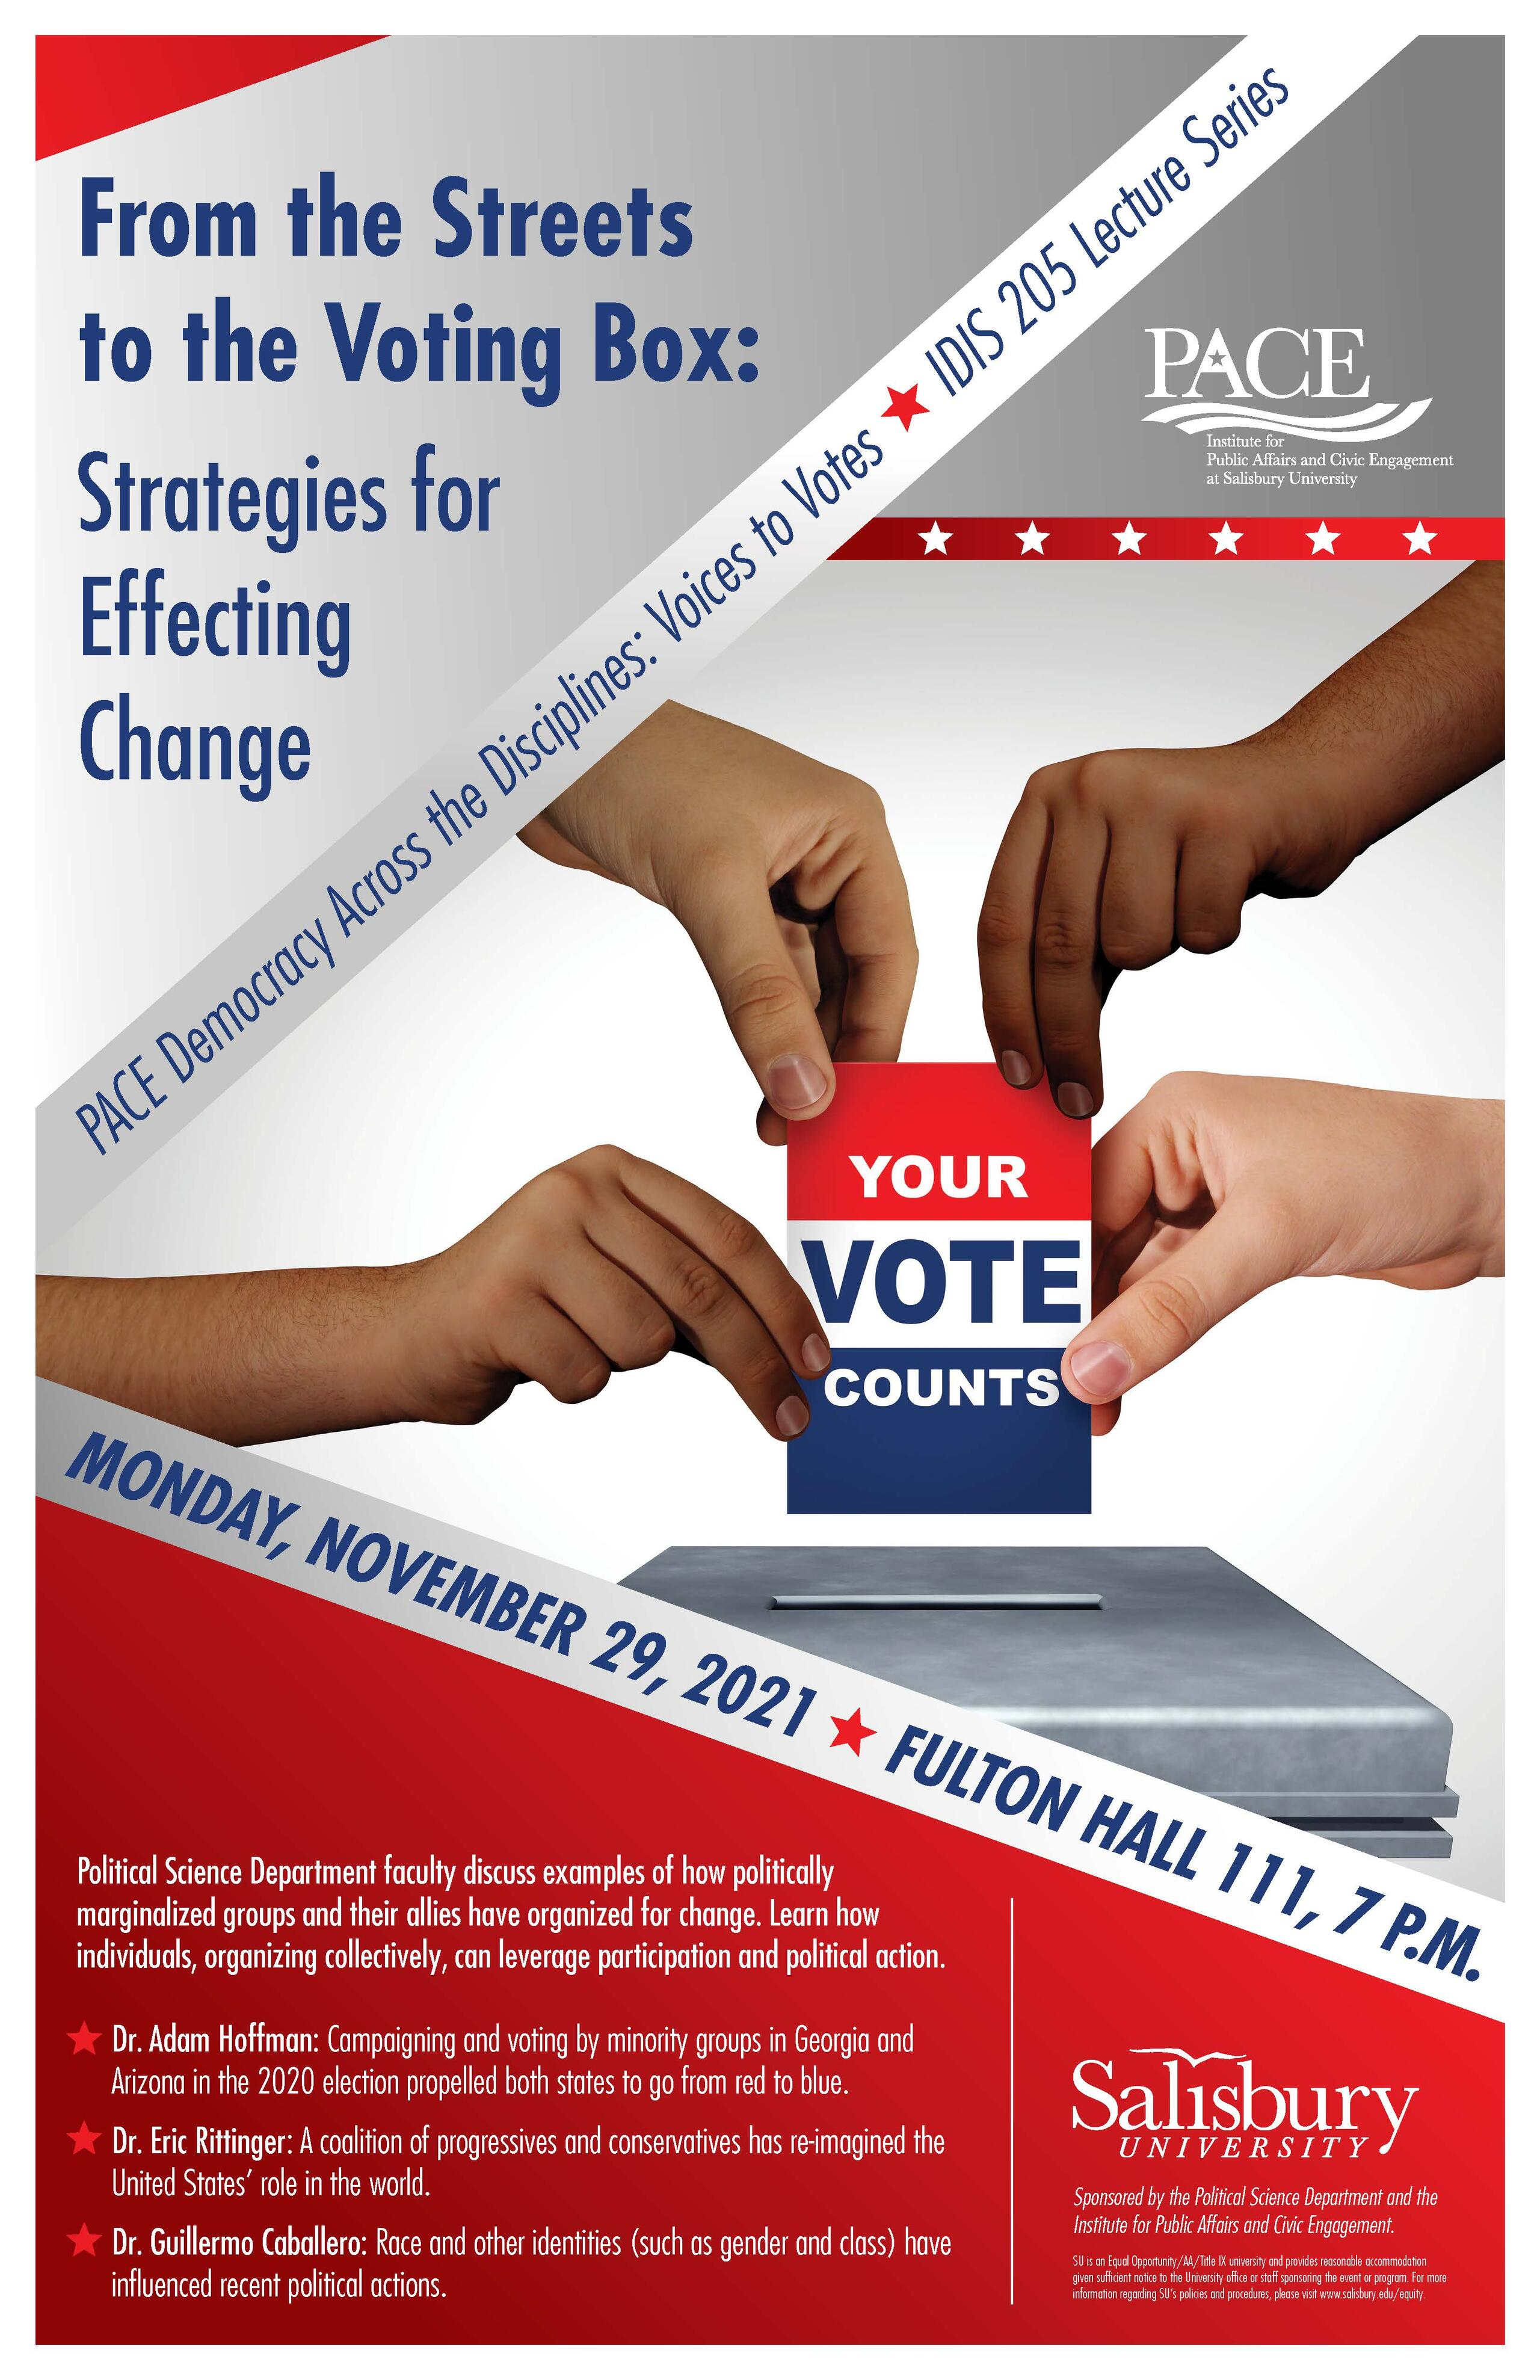 Democracy-Across-Disciplines_Poster_PUB-5320_F21-2-1.jpg